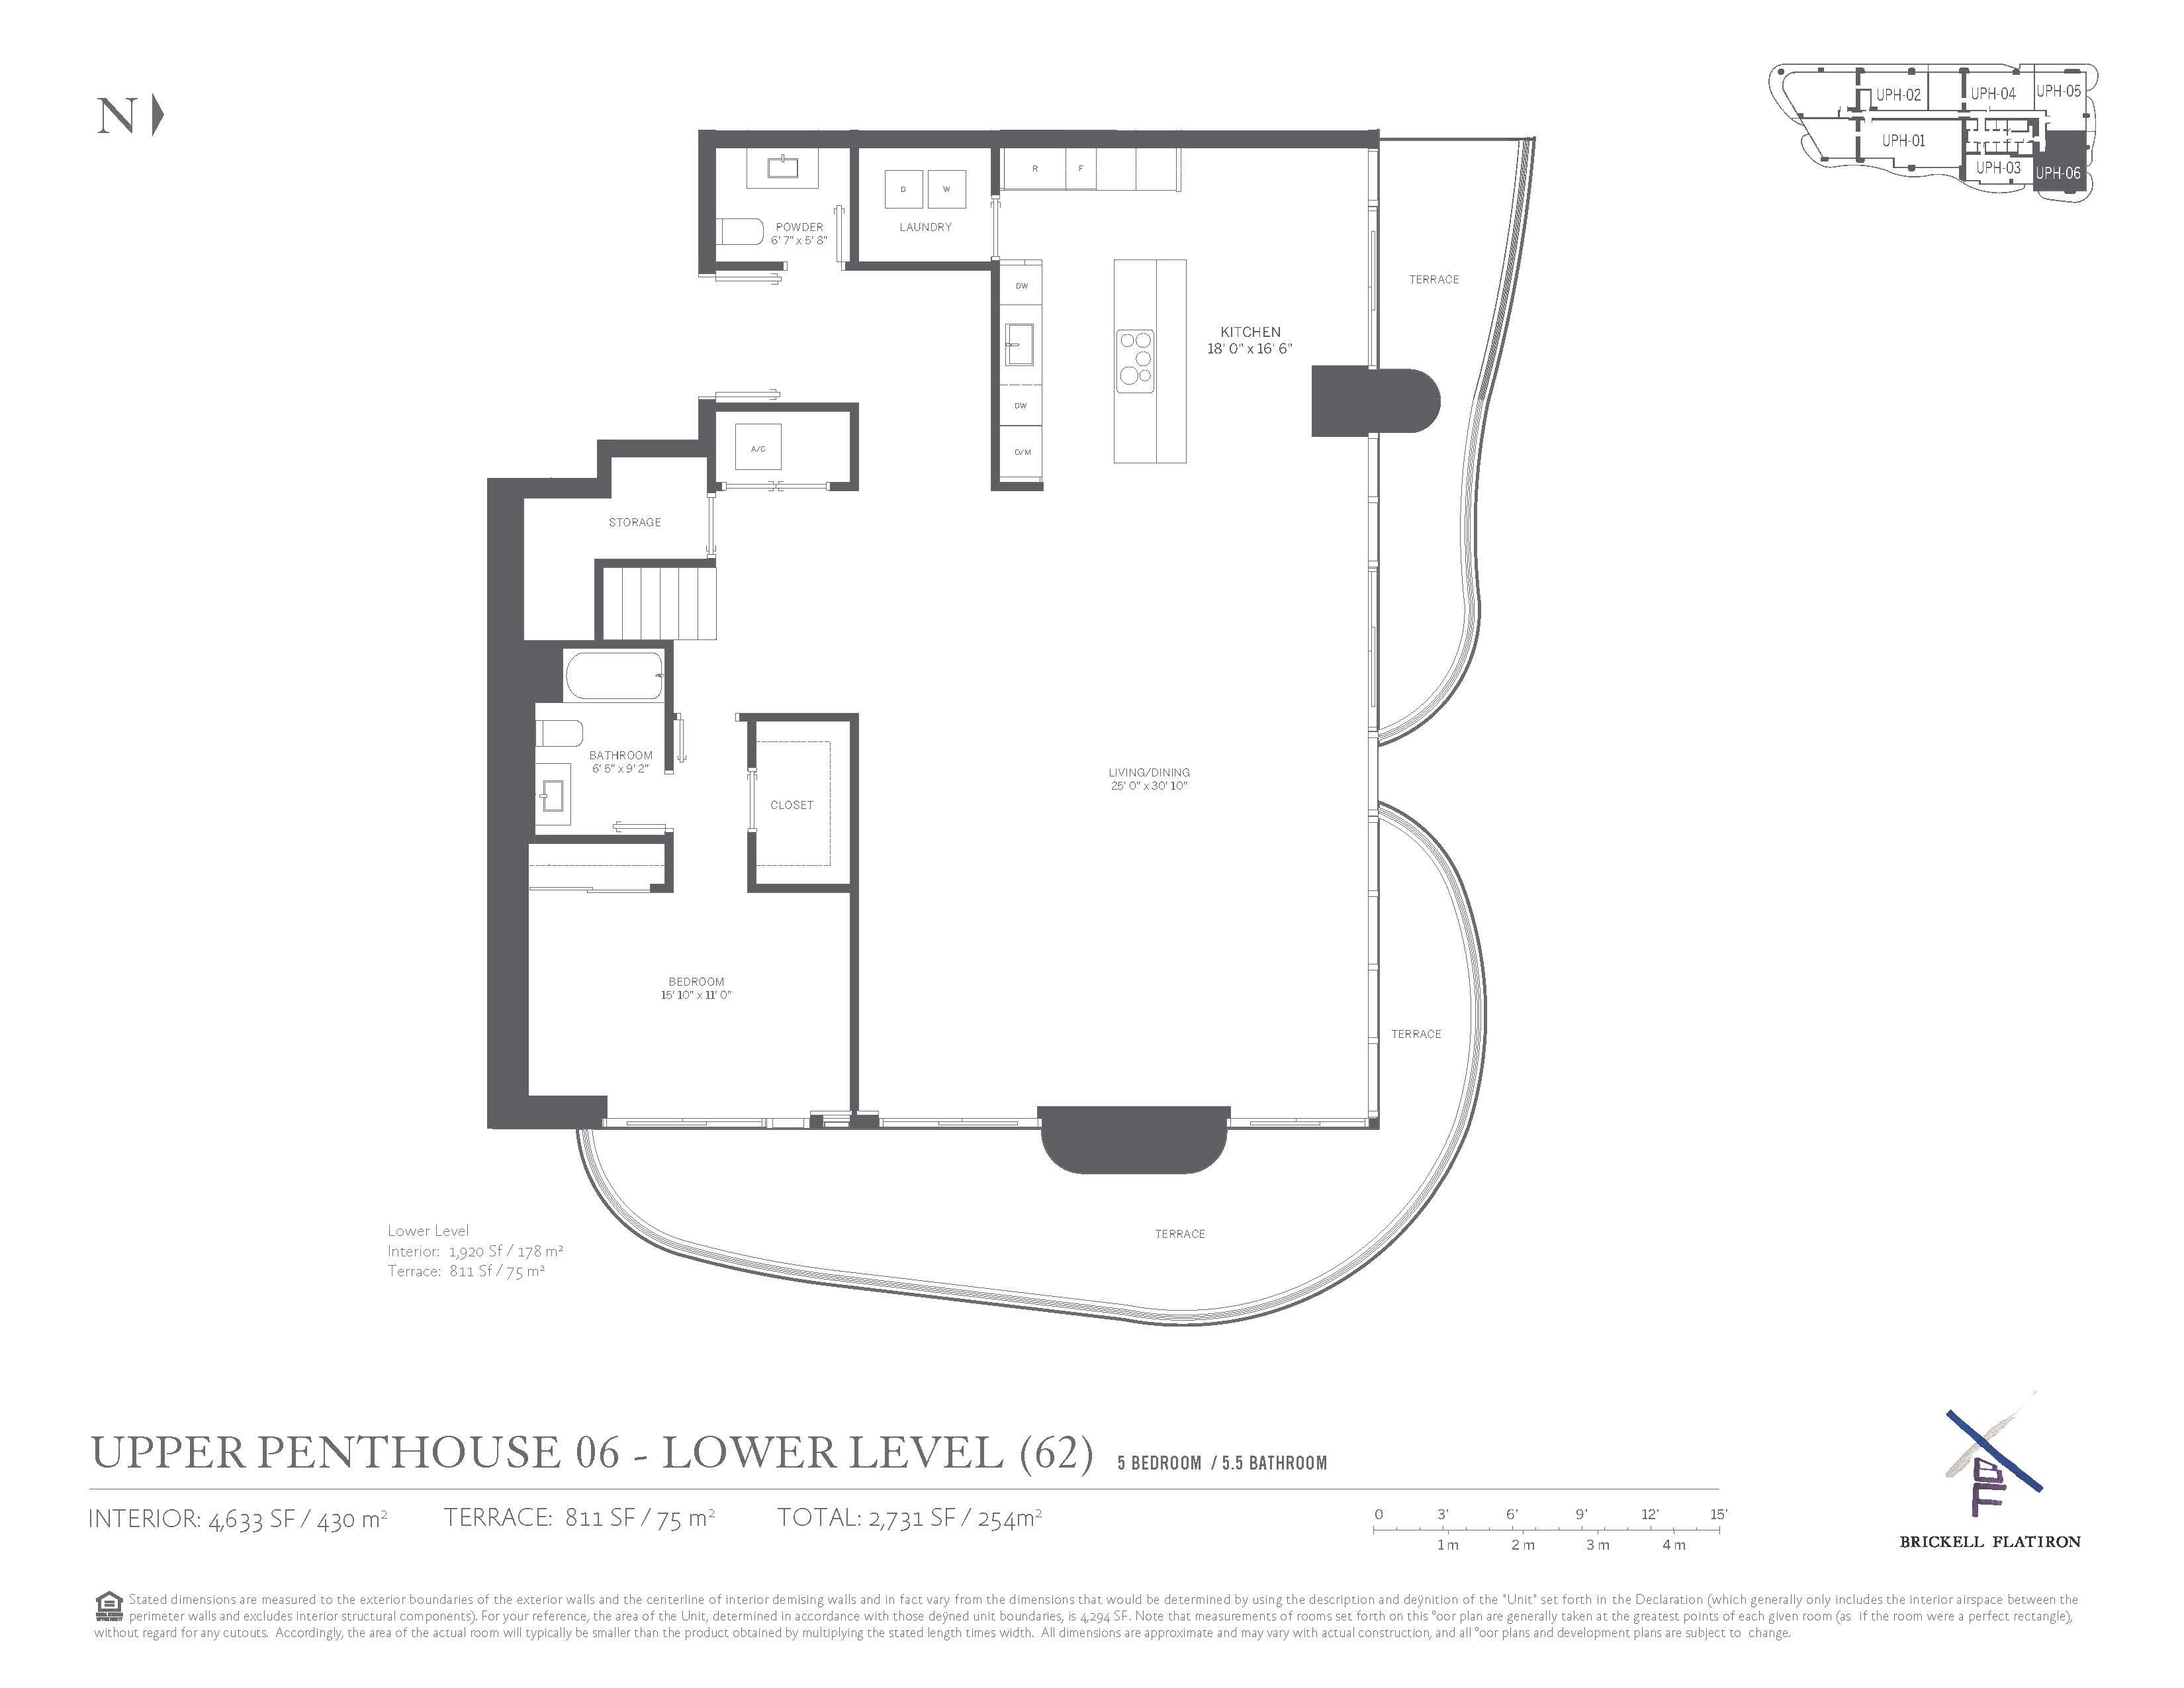 Brickell Flatiron UPH06 floor plan lower level